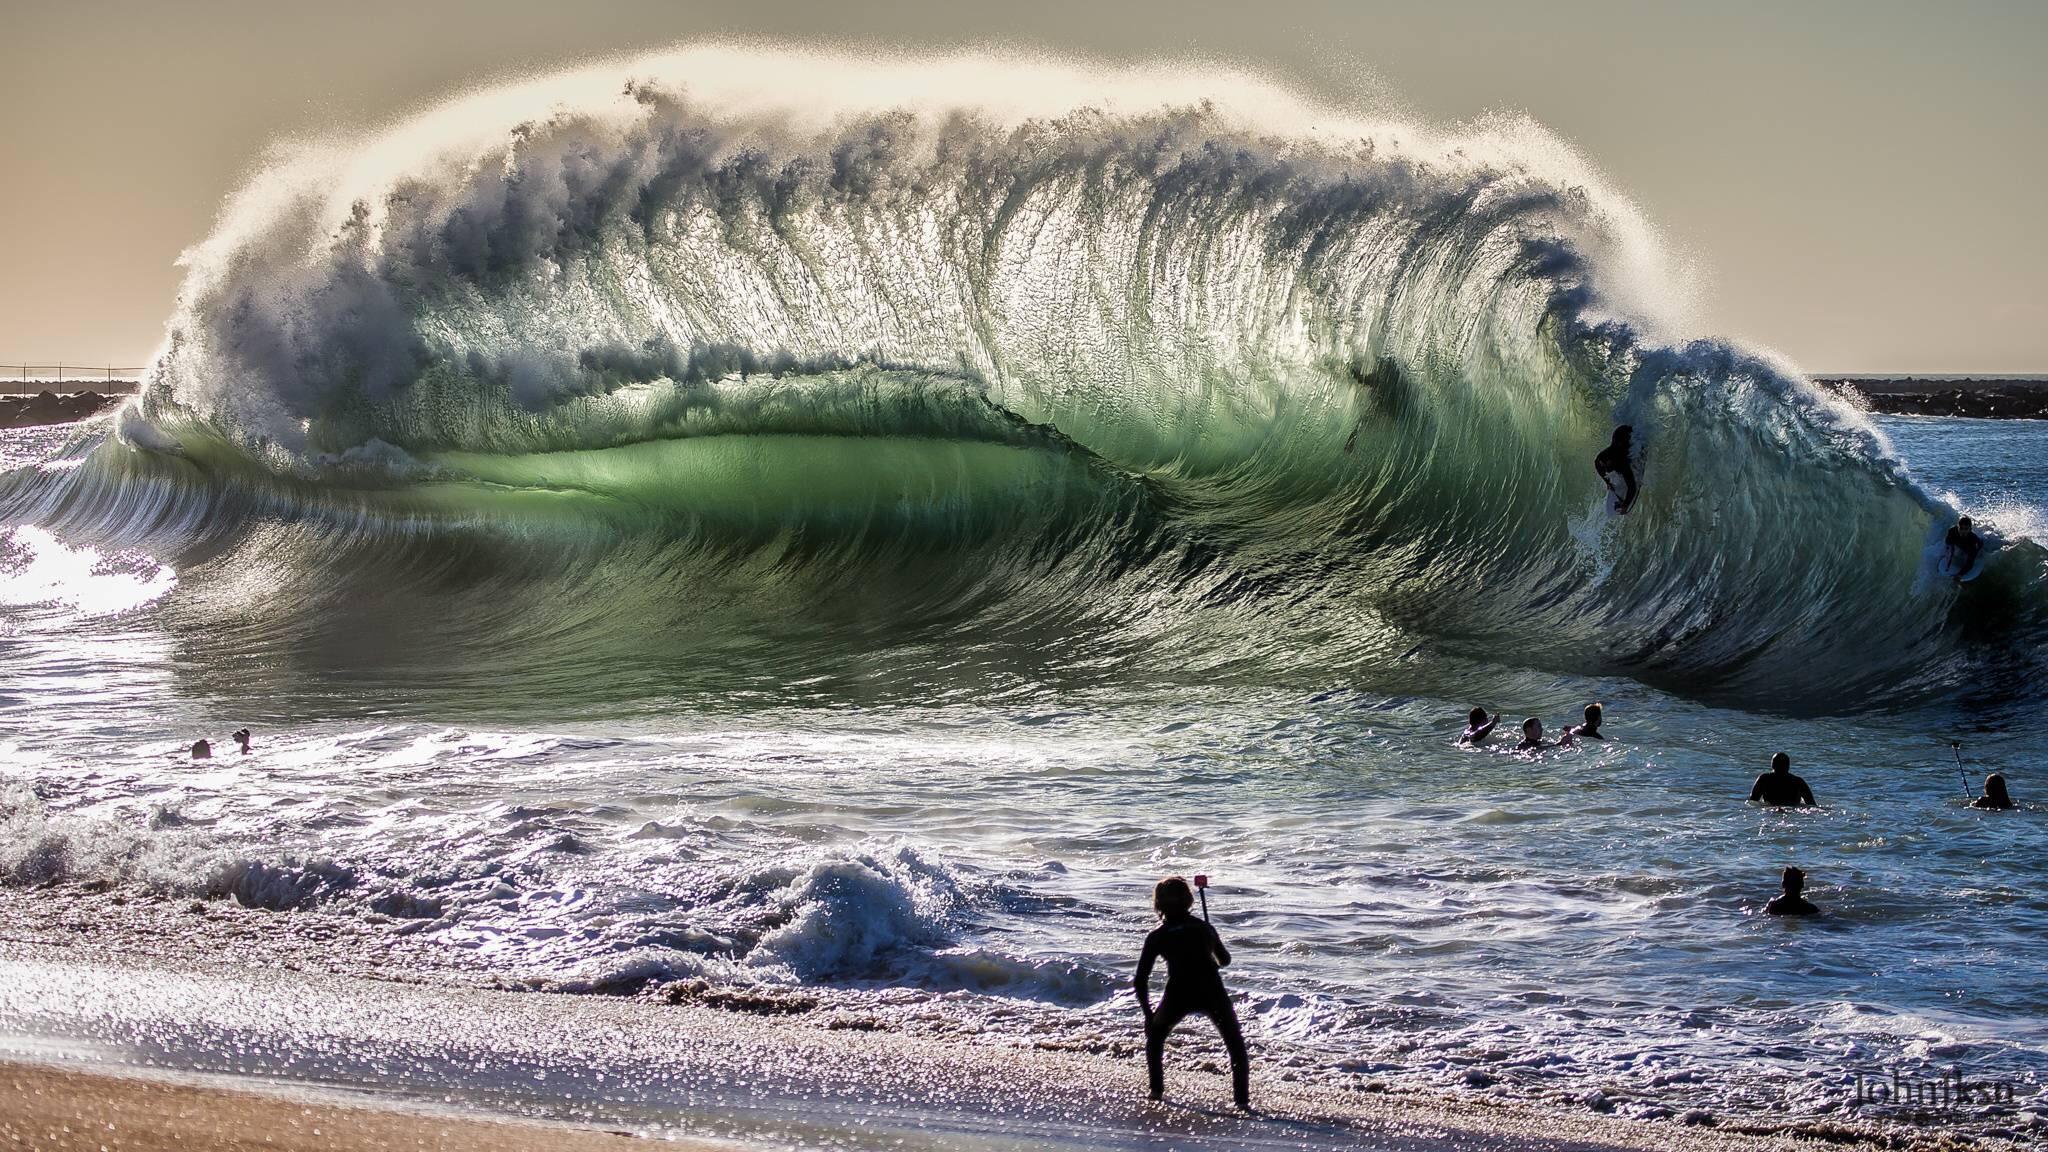 A giant backwash wave